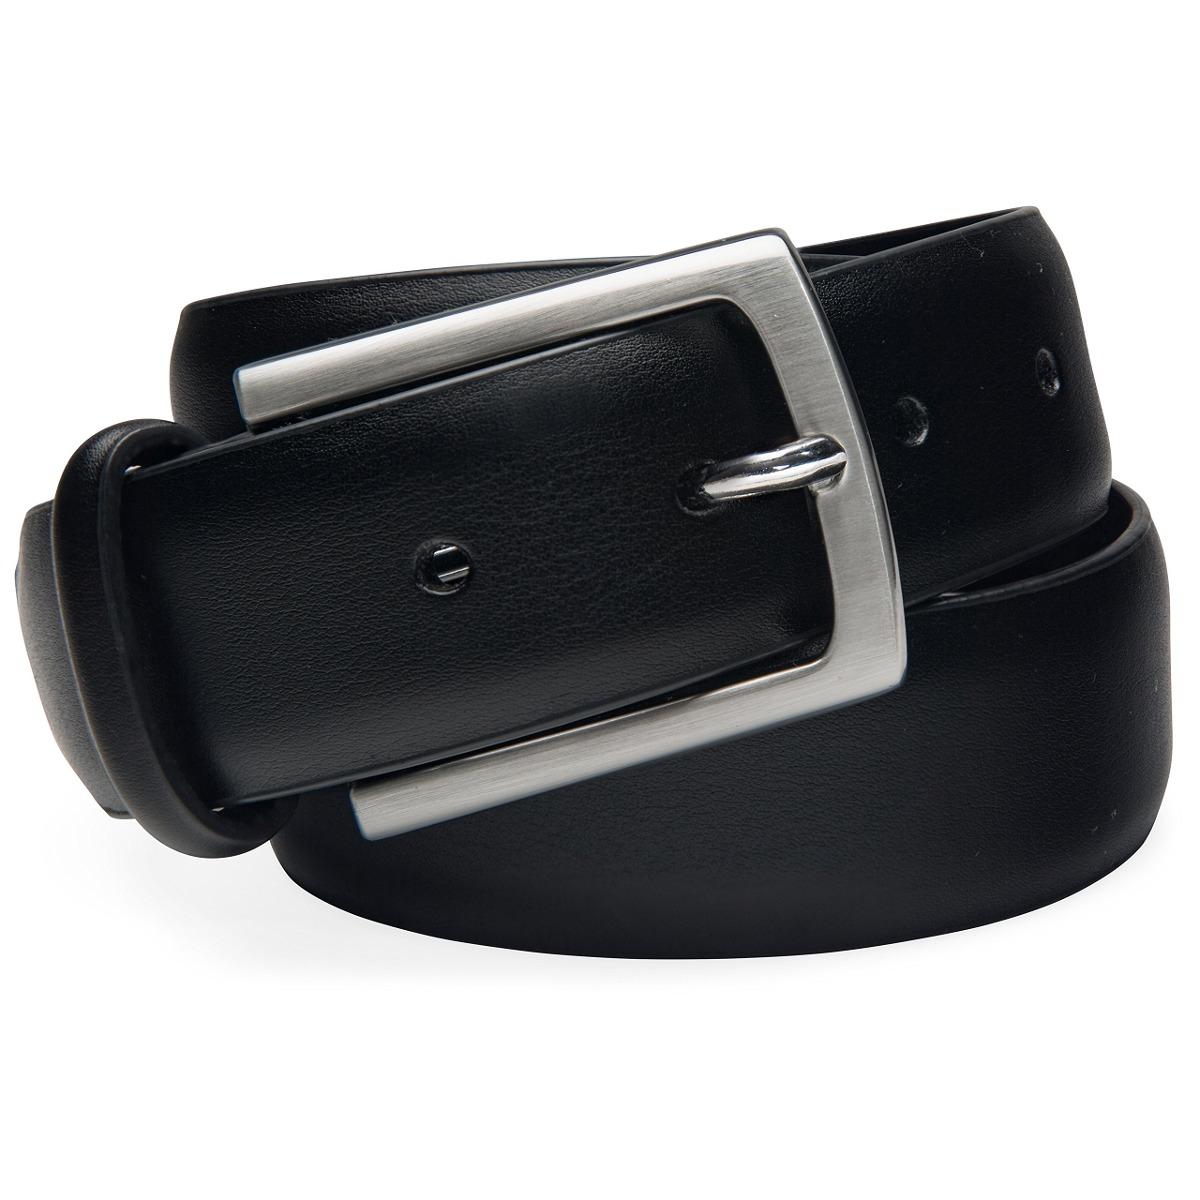 2d0920de297 Cinturón De Cuero Negro Para Hombre De Vellette - ¡divers - U S 50 ...